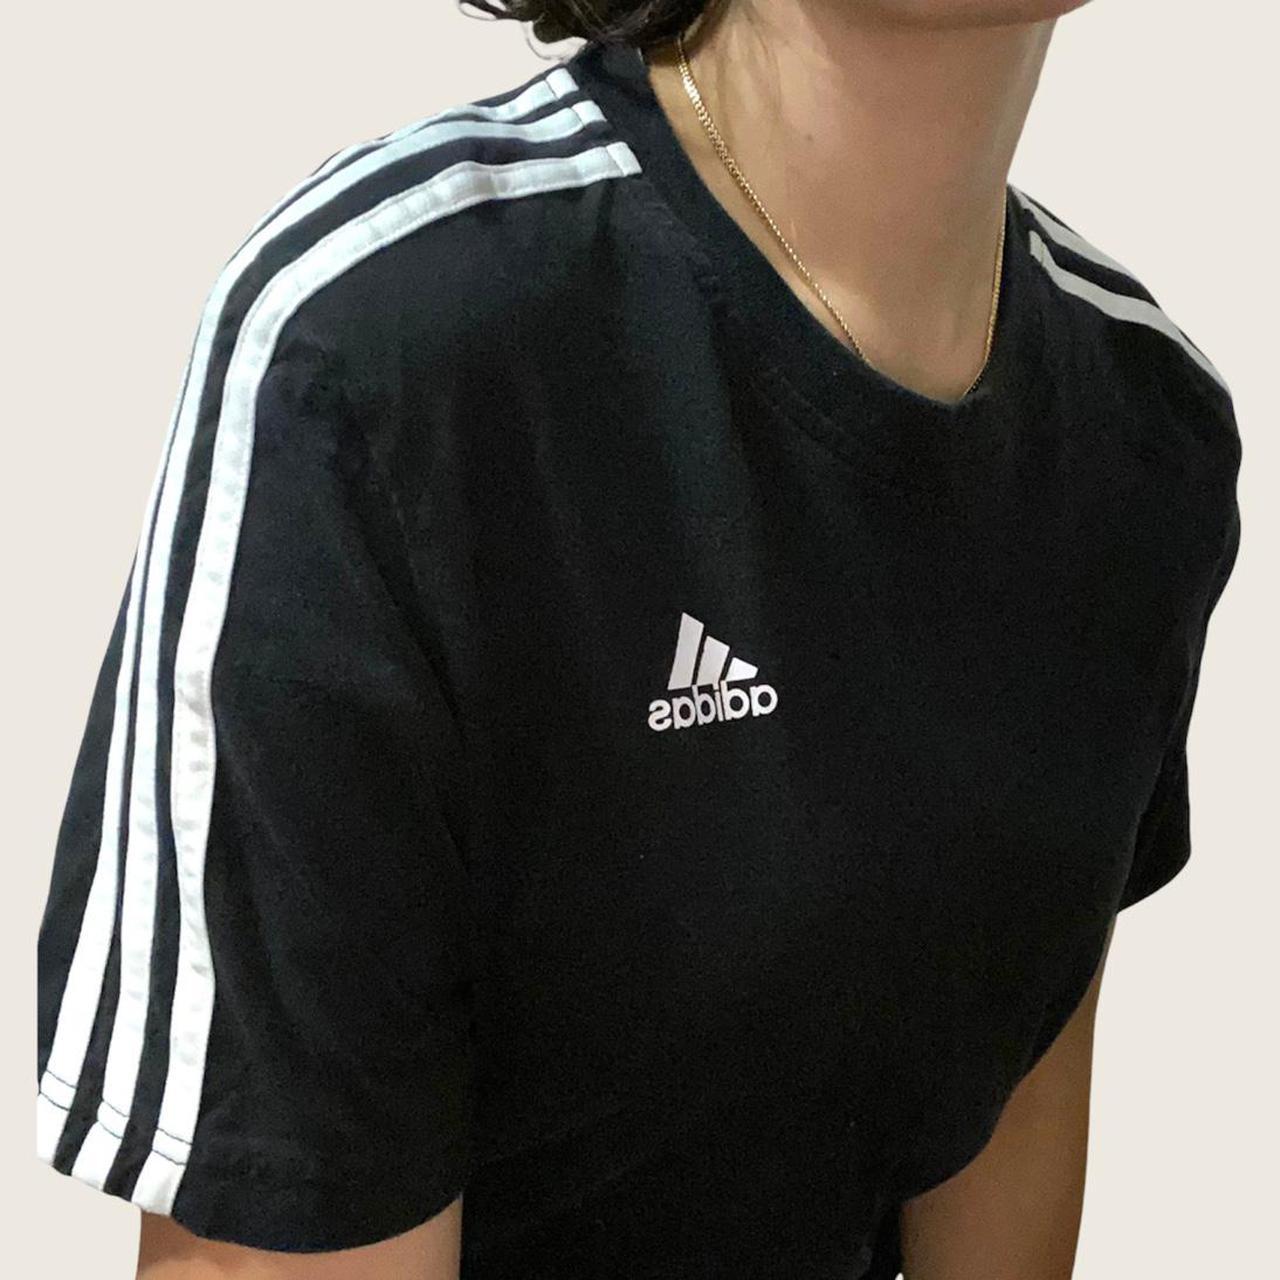 Product Image 1 - Mens Medium Adidas 3 Stripes